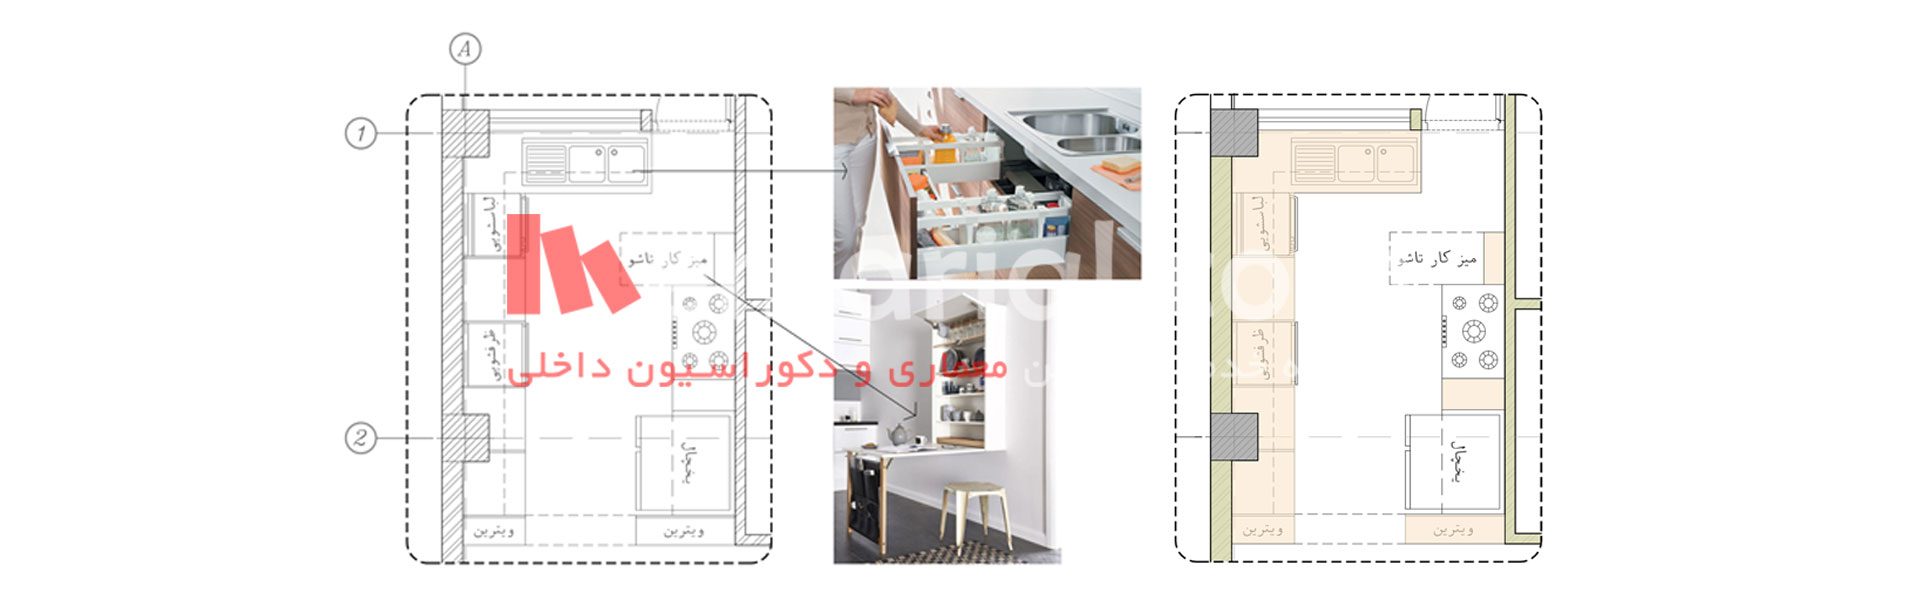 طراحی و اجرای دکوراسیون معماریال